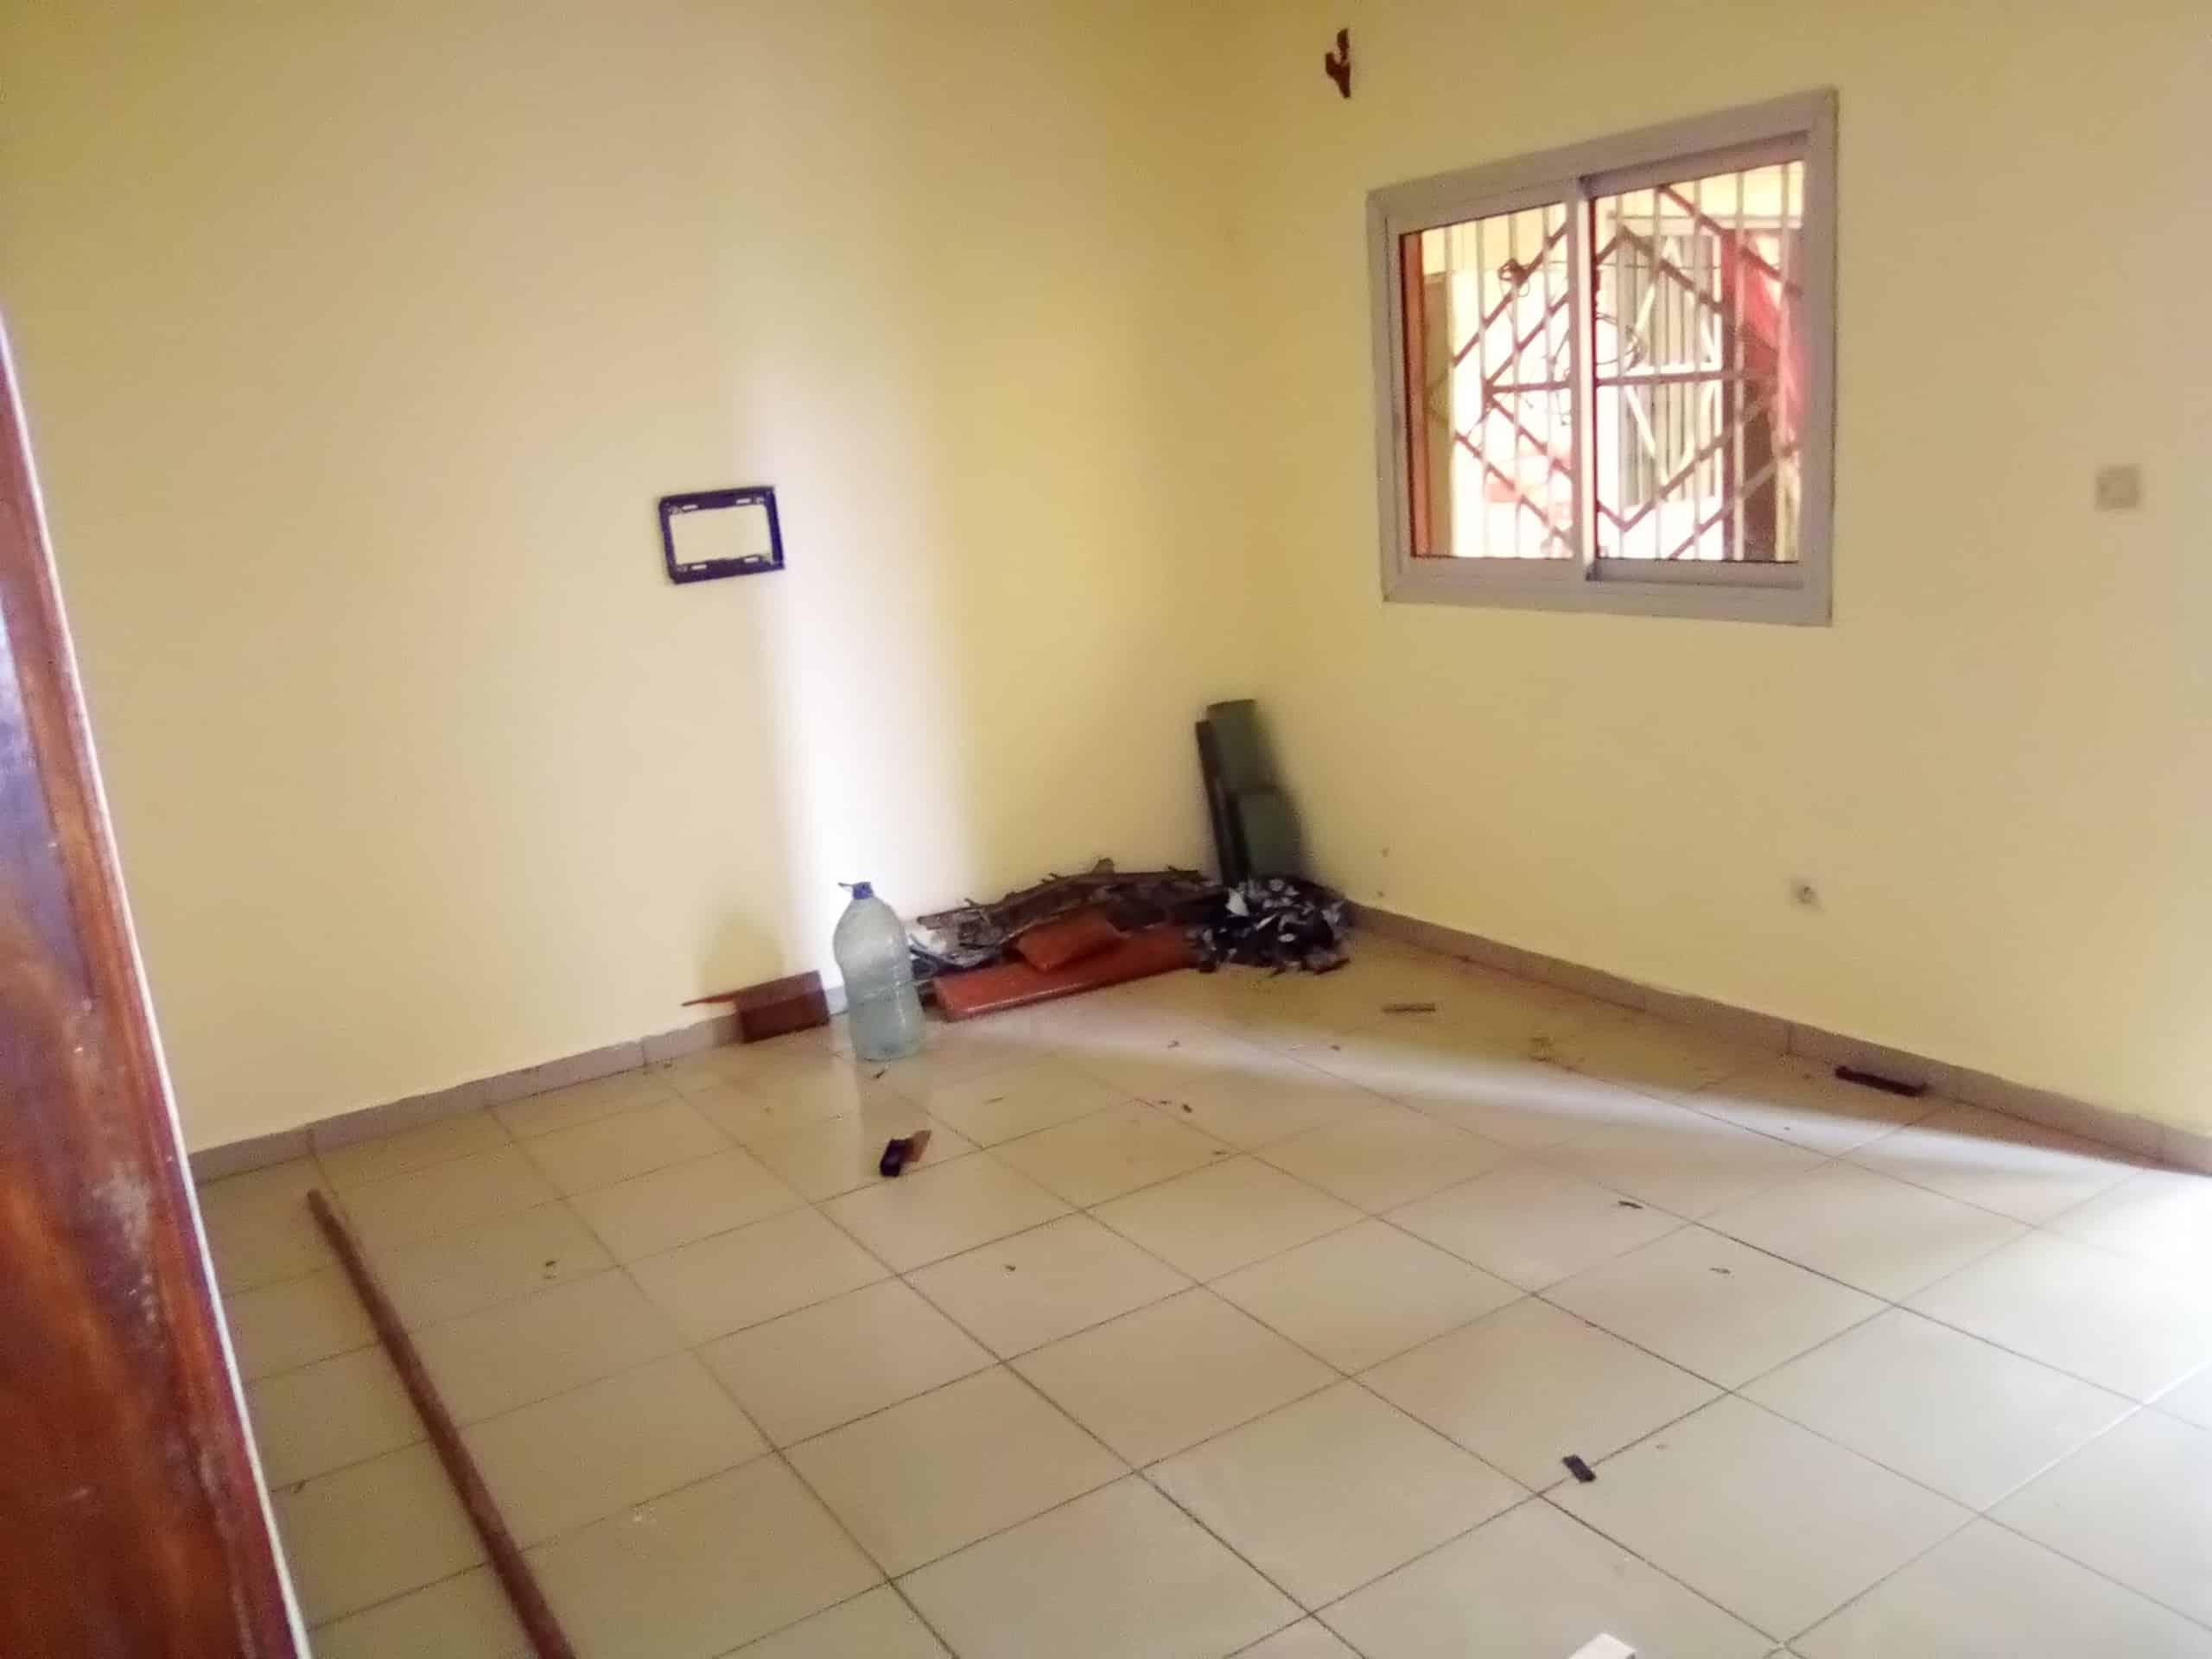 Apartment to rent - Douala, Makepe, bm - 1 living room(s), 1 bedroom(s), 1 bathroom(s) - 70 000 FCFA / month